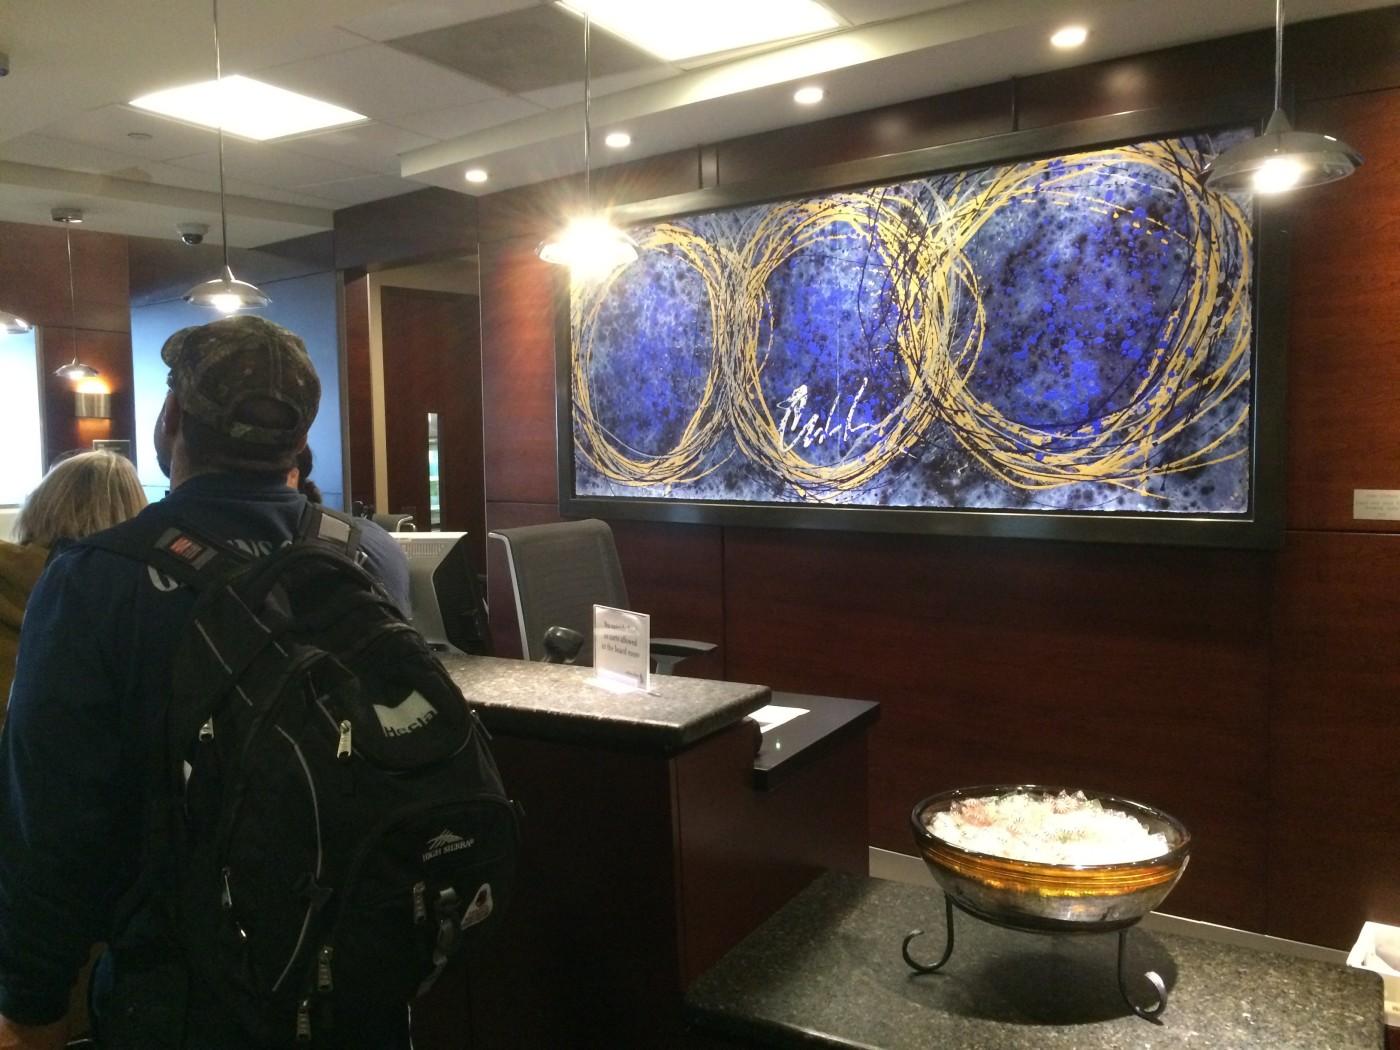 Alaska Airlines Alaska Lounges The Ultimate Guide